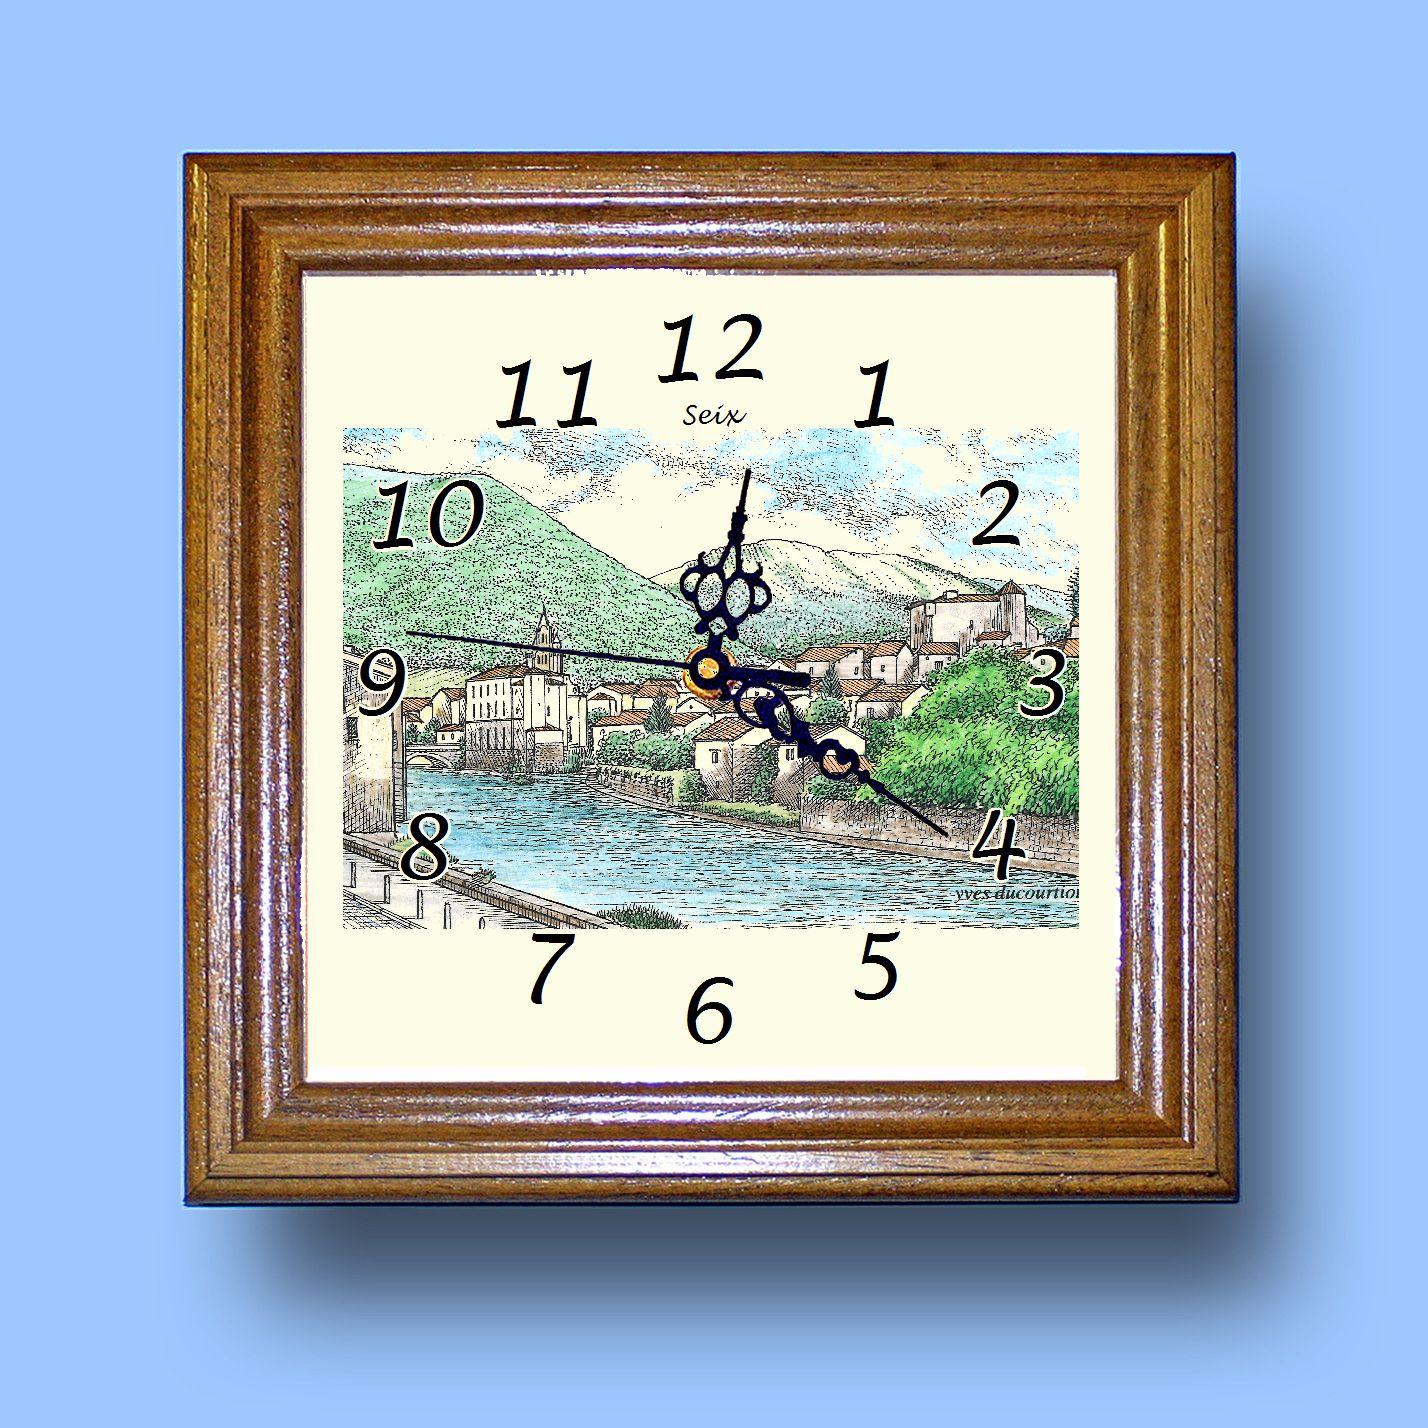 HG CL 09172 - Horloge avec une vue de 09 SEIX Z44QgeAk-09112044-885535668